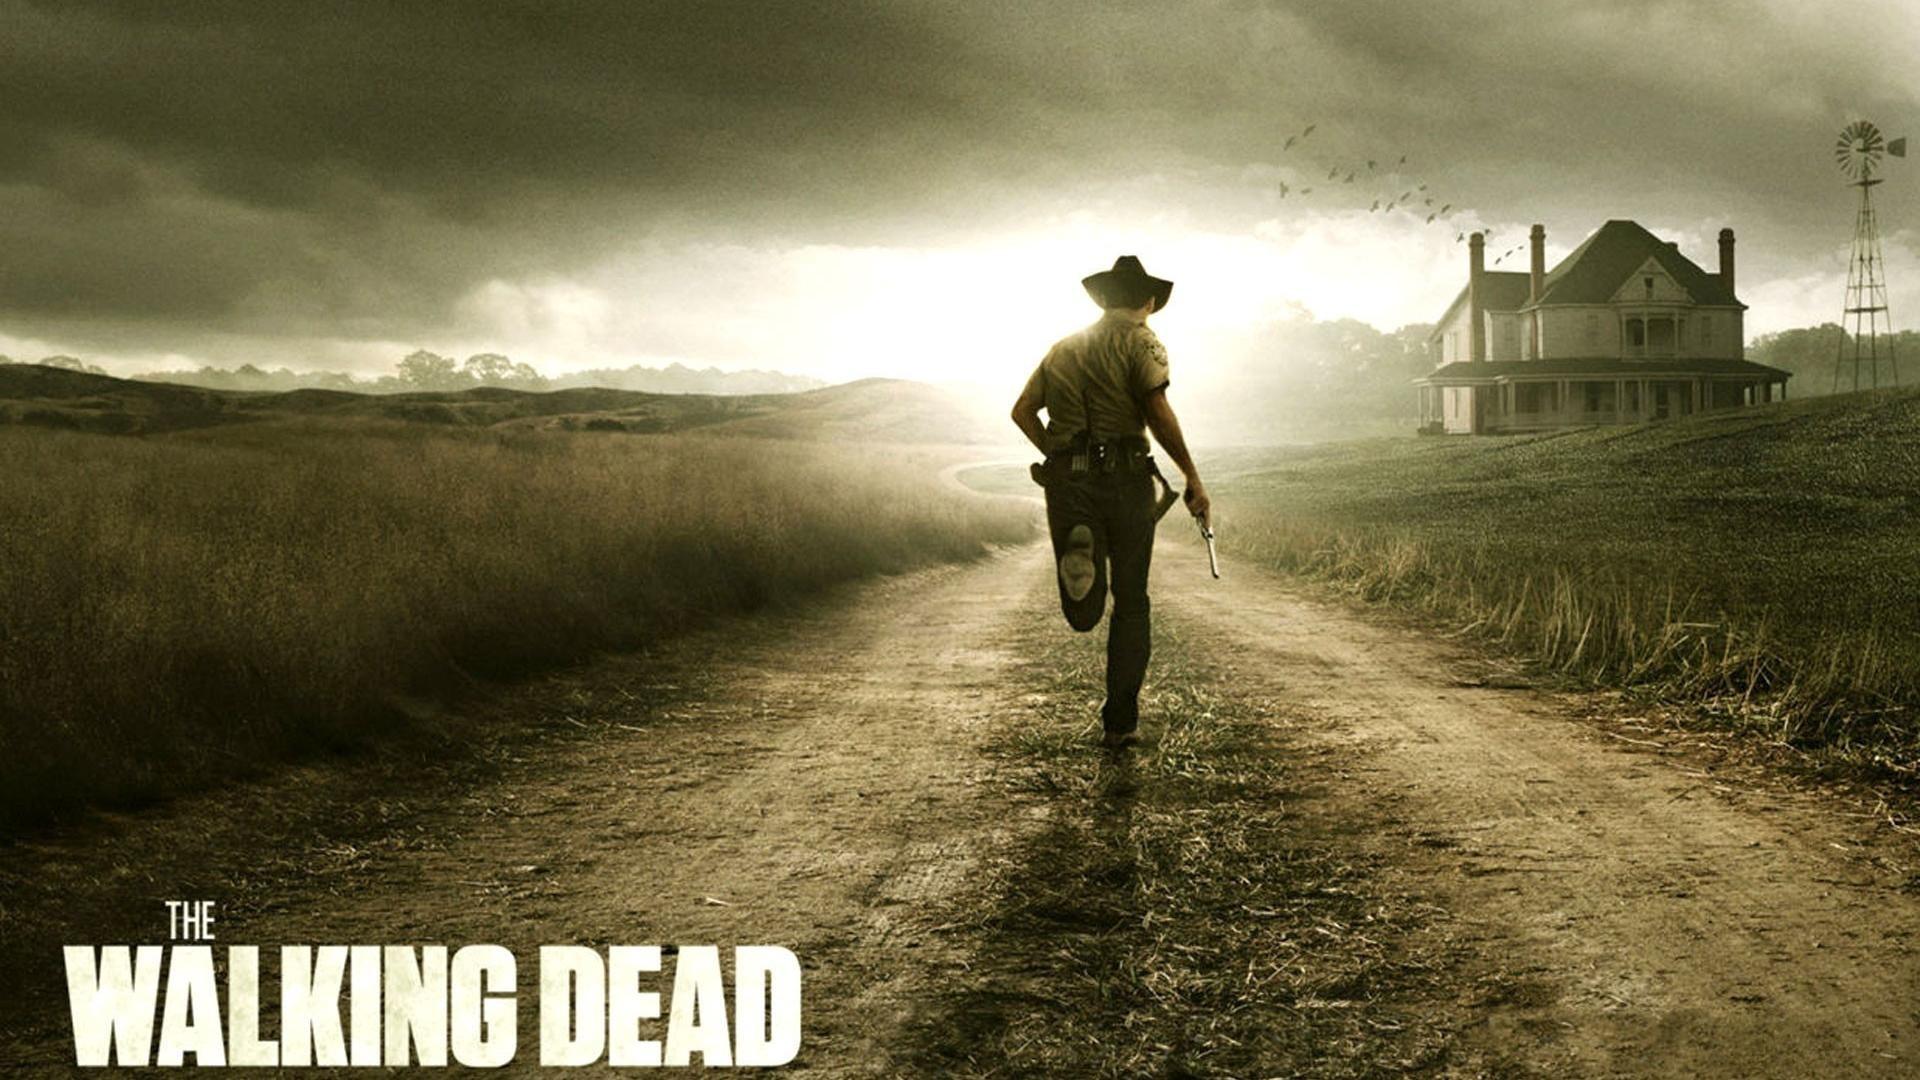 The Walking Dead HD photos